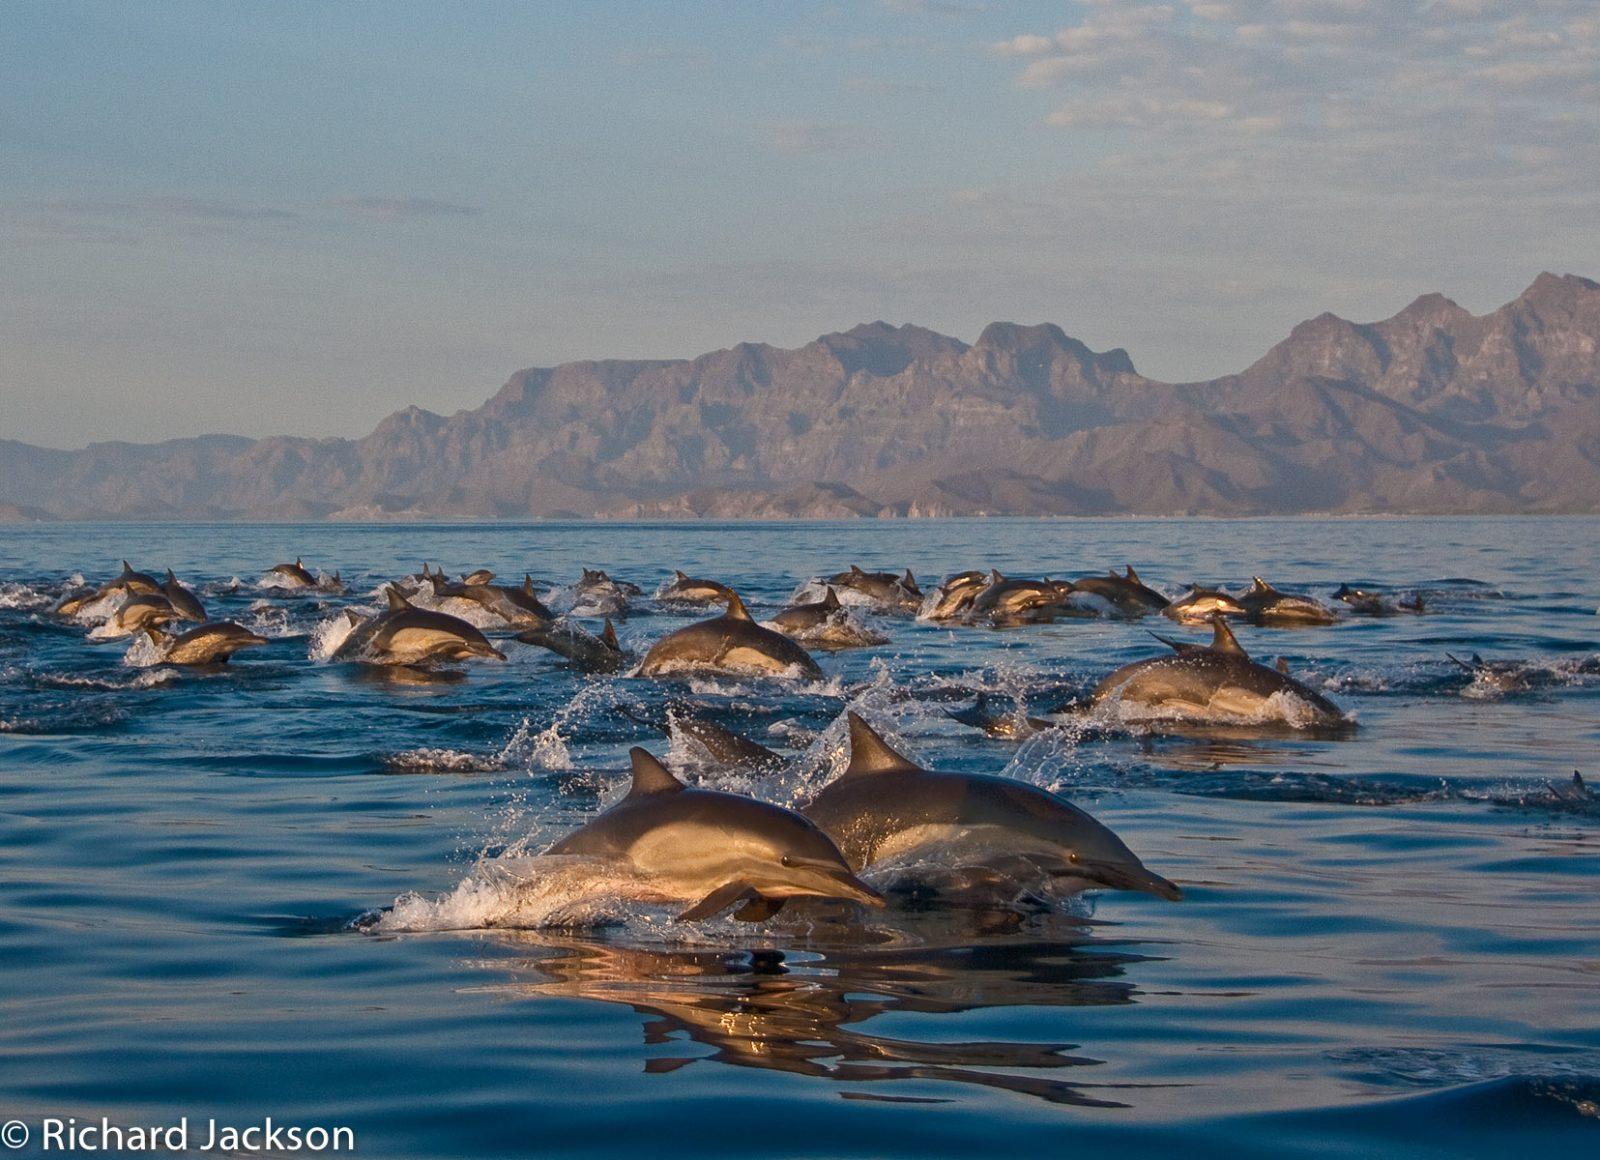 UC Natural Reserve System gains sister reserve in Baja California Sur 8